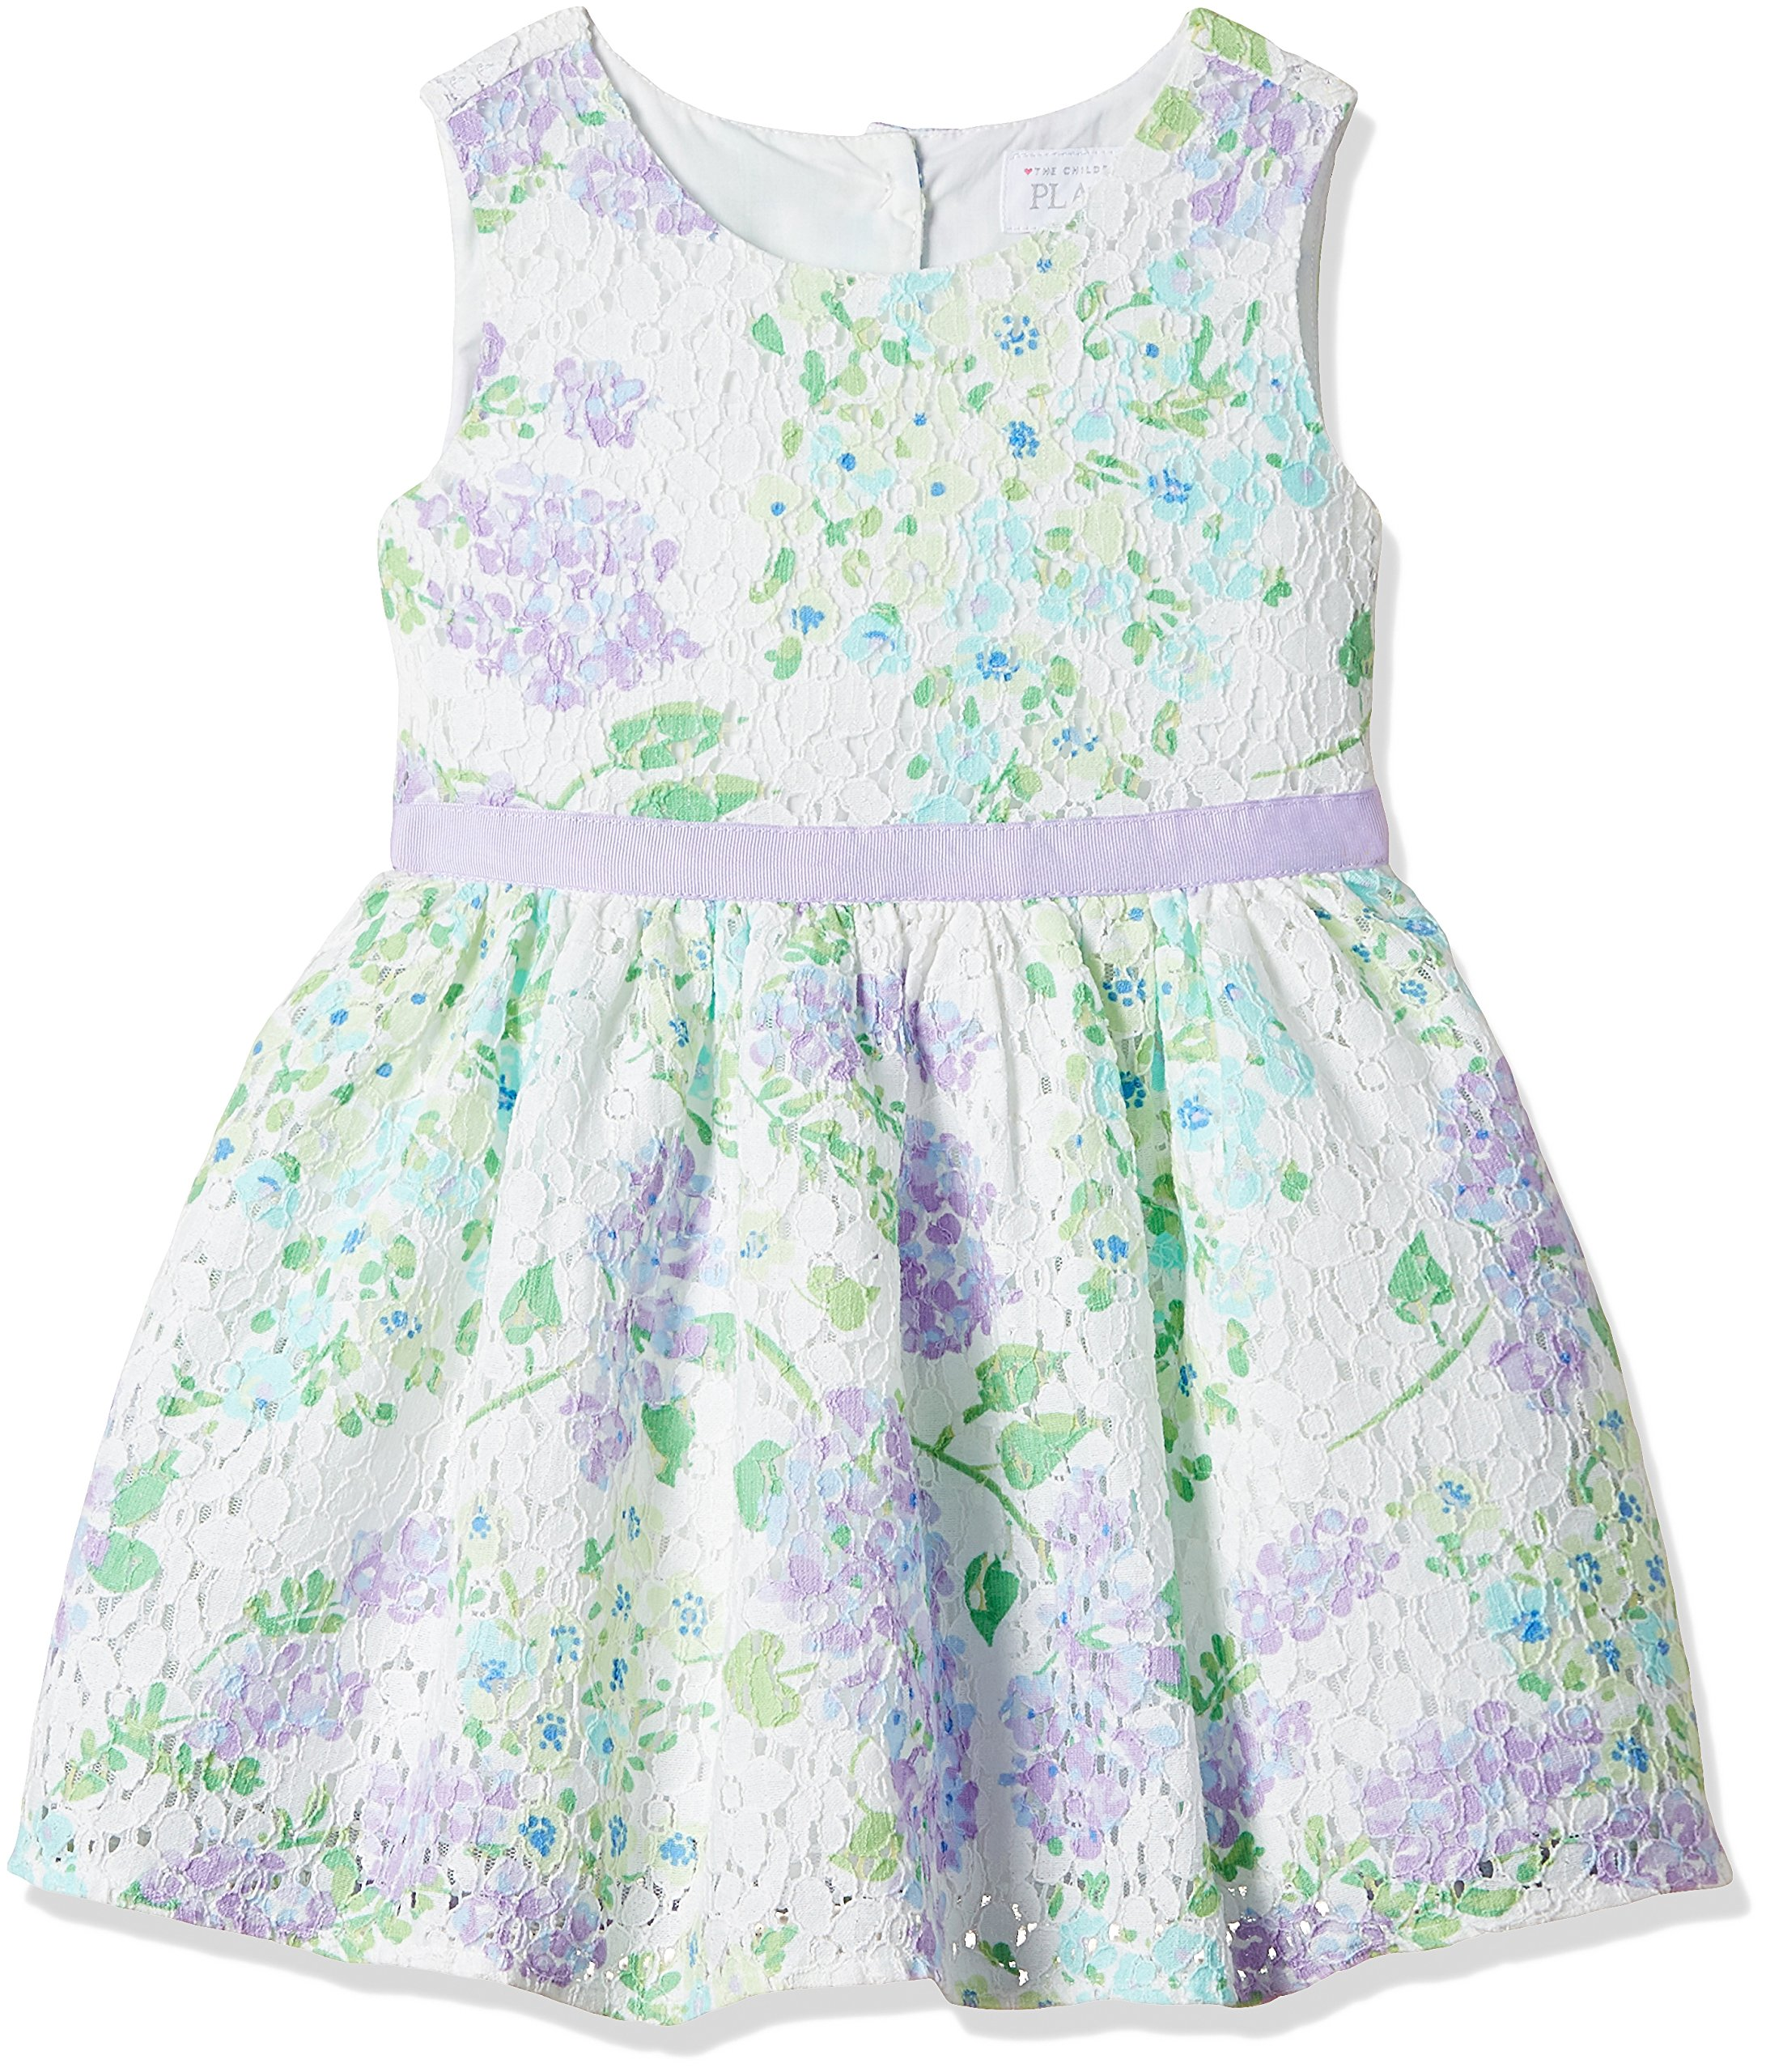 ec5cecf2b855 Galleon - The Children's Place Little Girls' Sleeveless Dressy Dresses,  Purple Ribbon 8173, 4